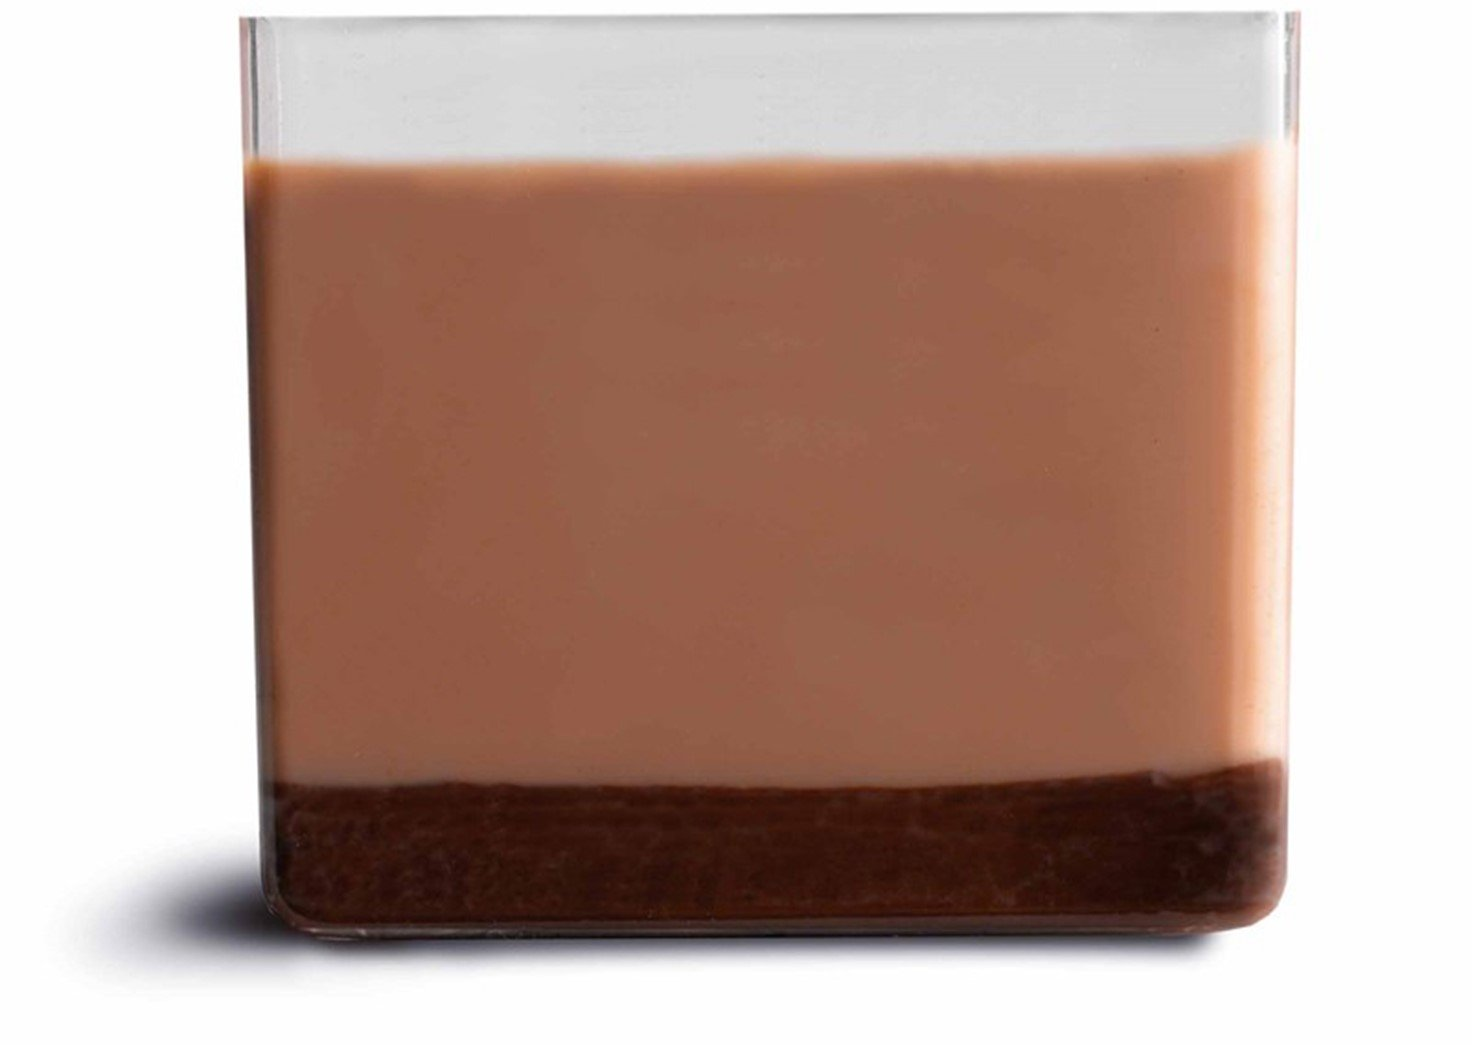 Cocolate Milk Sedimentation (1)